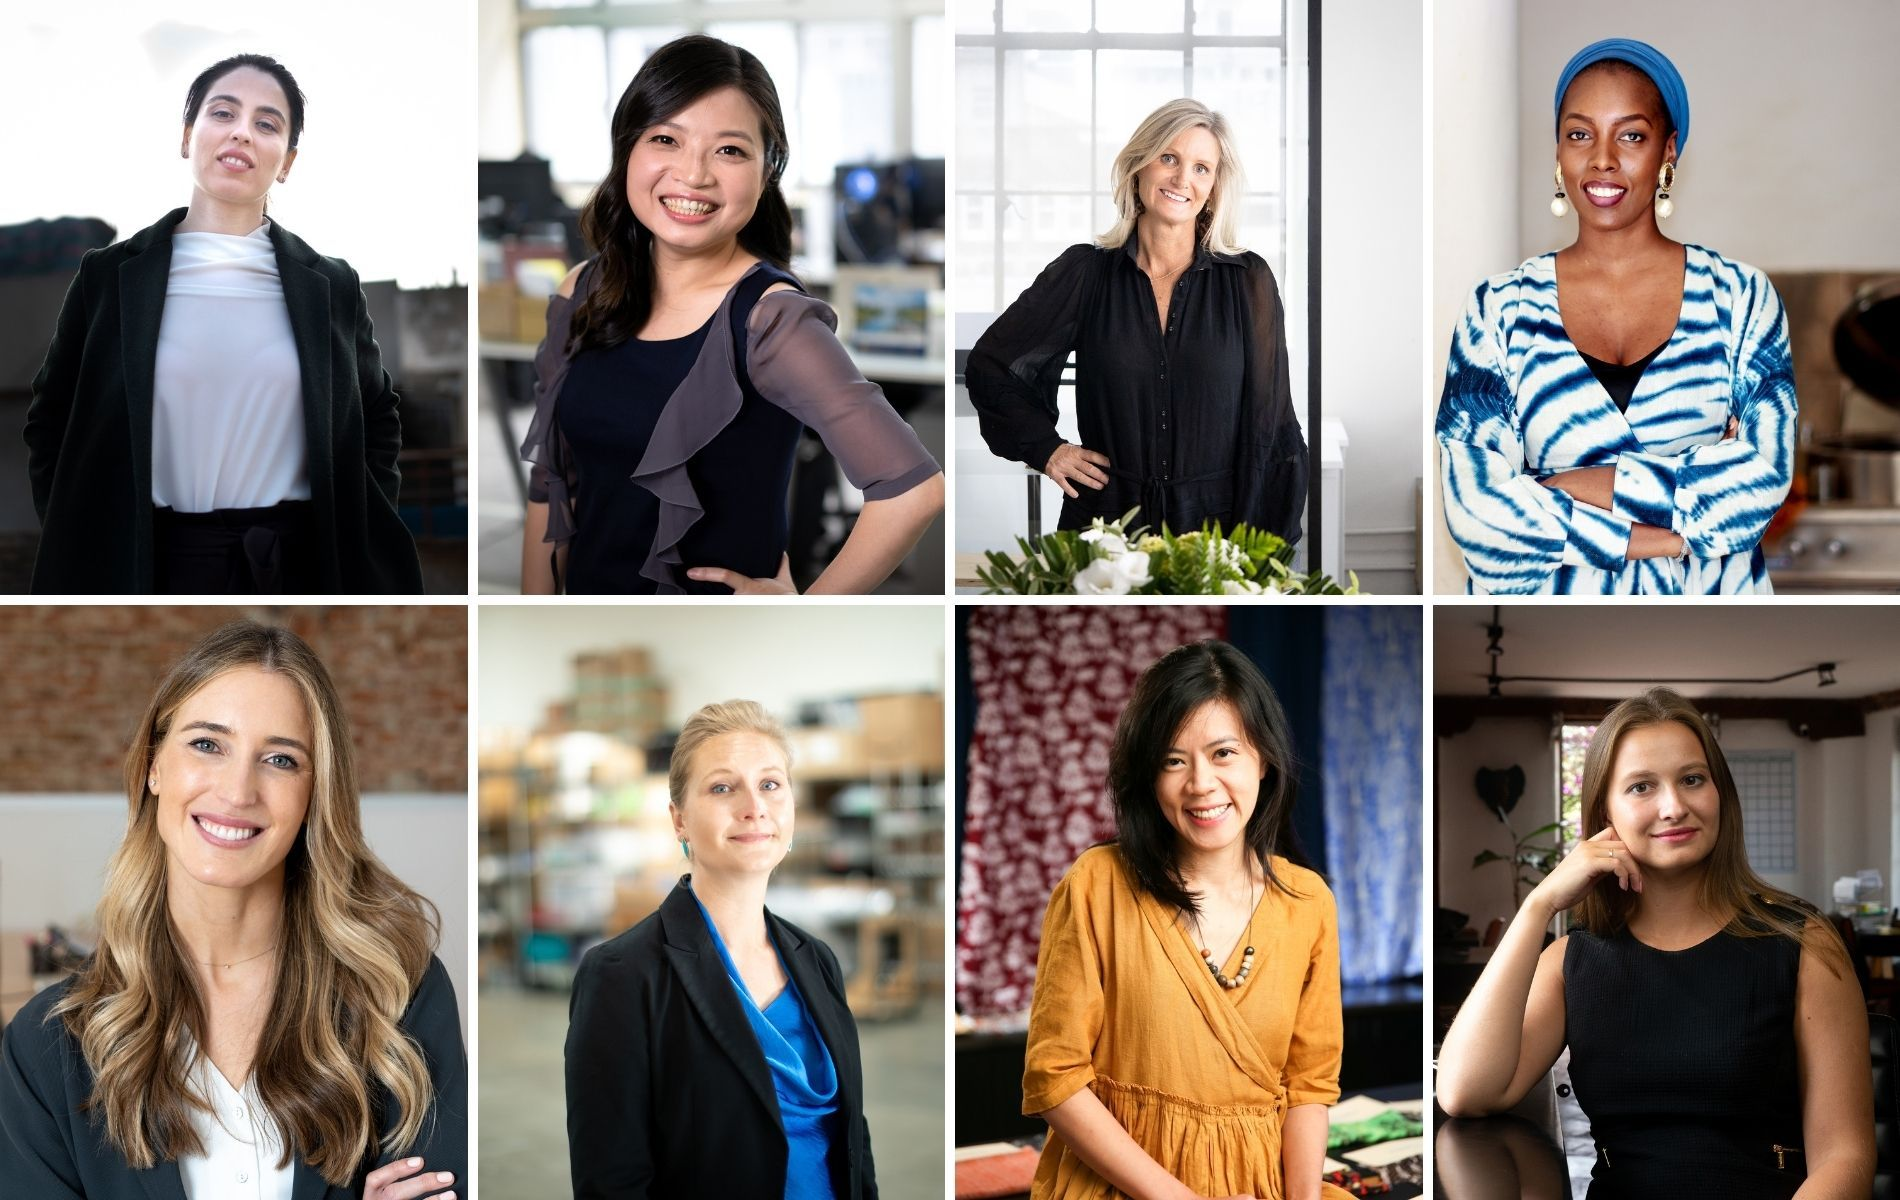 The 2021 laureates of Cartier Women's Initiative